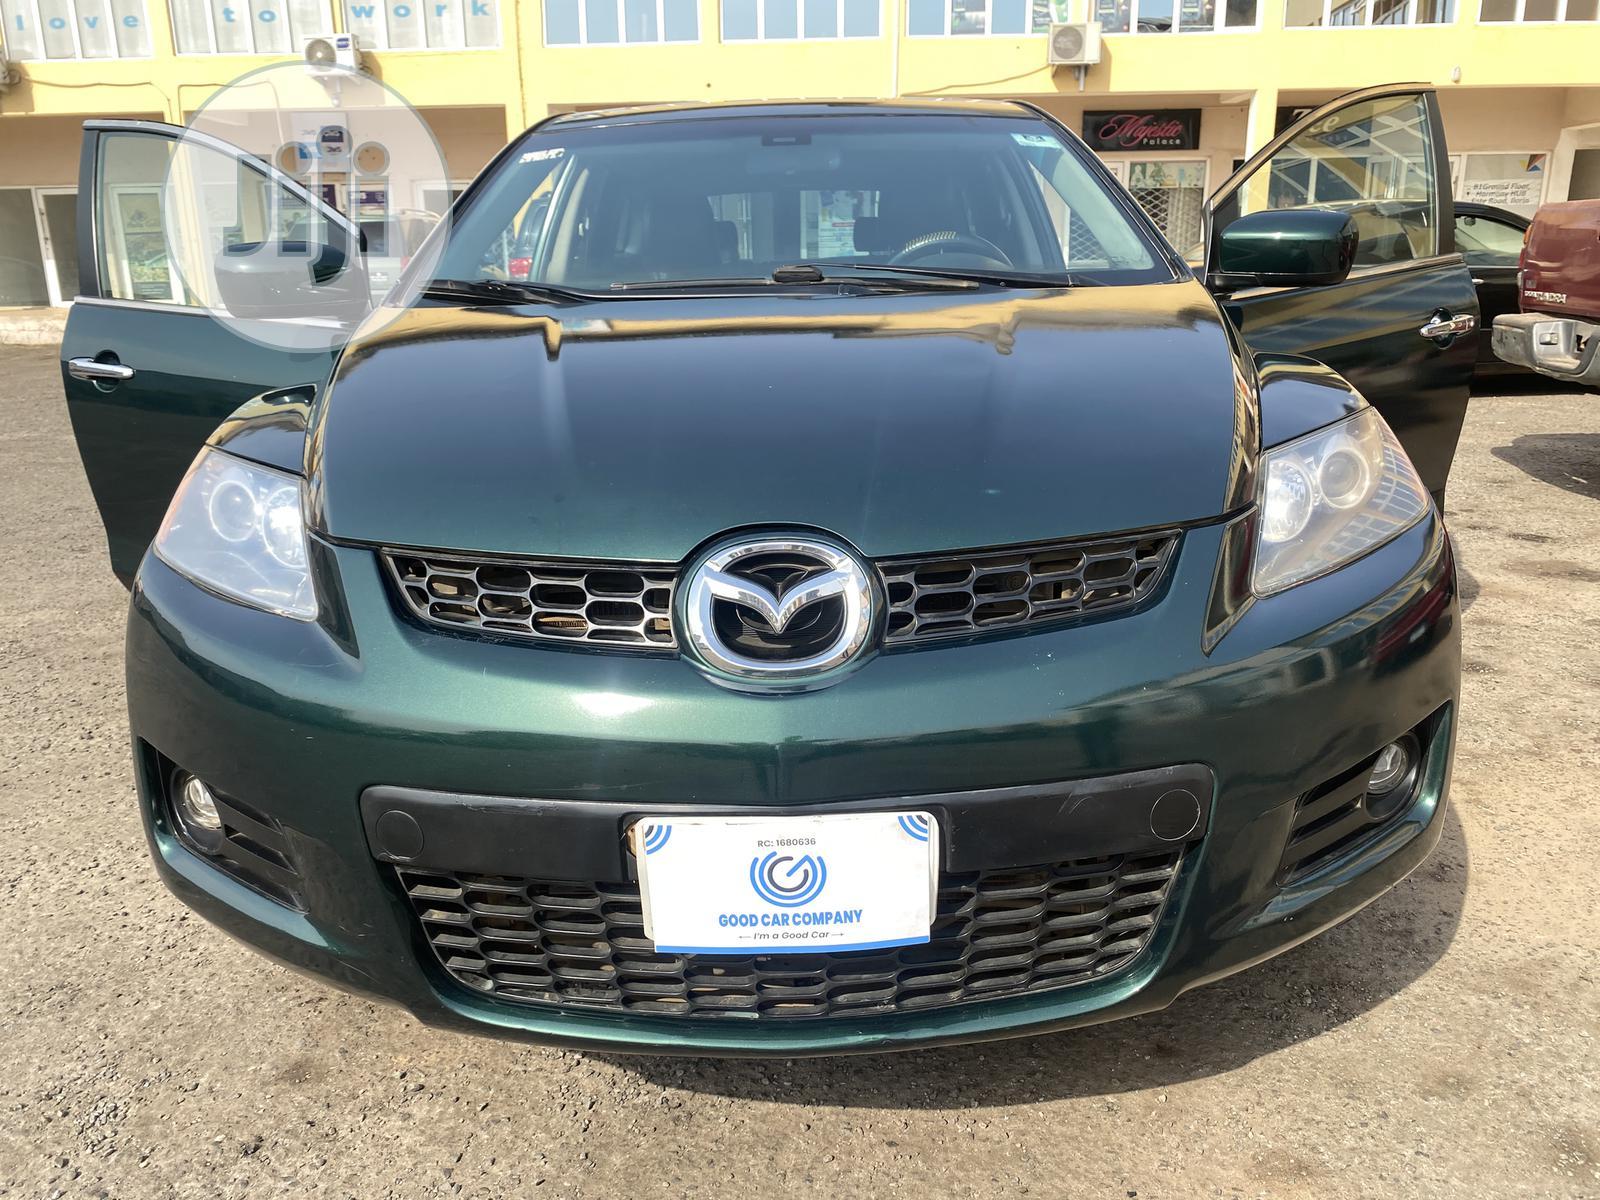 Mazda CX-7 2006 Green